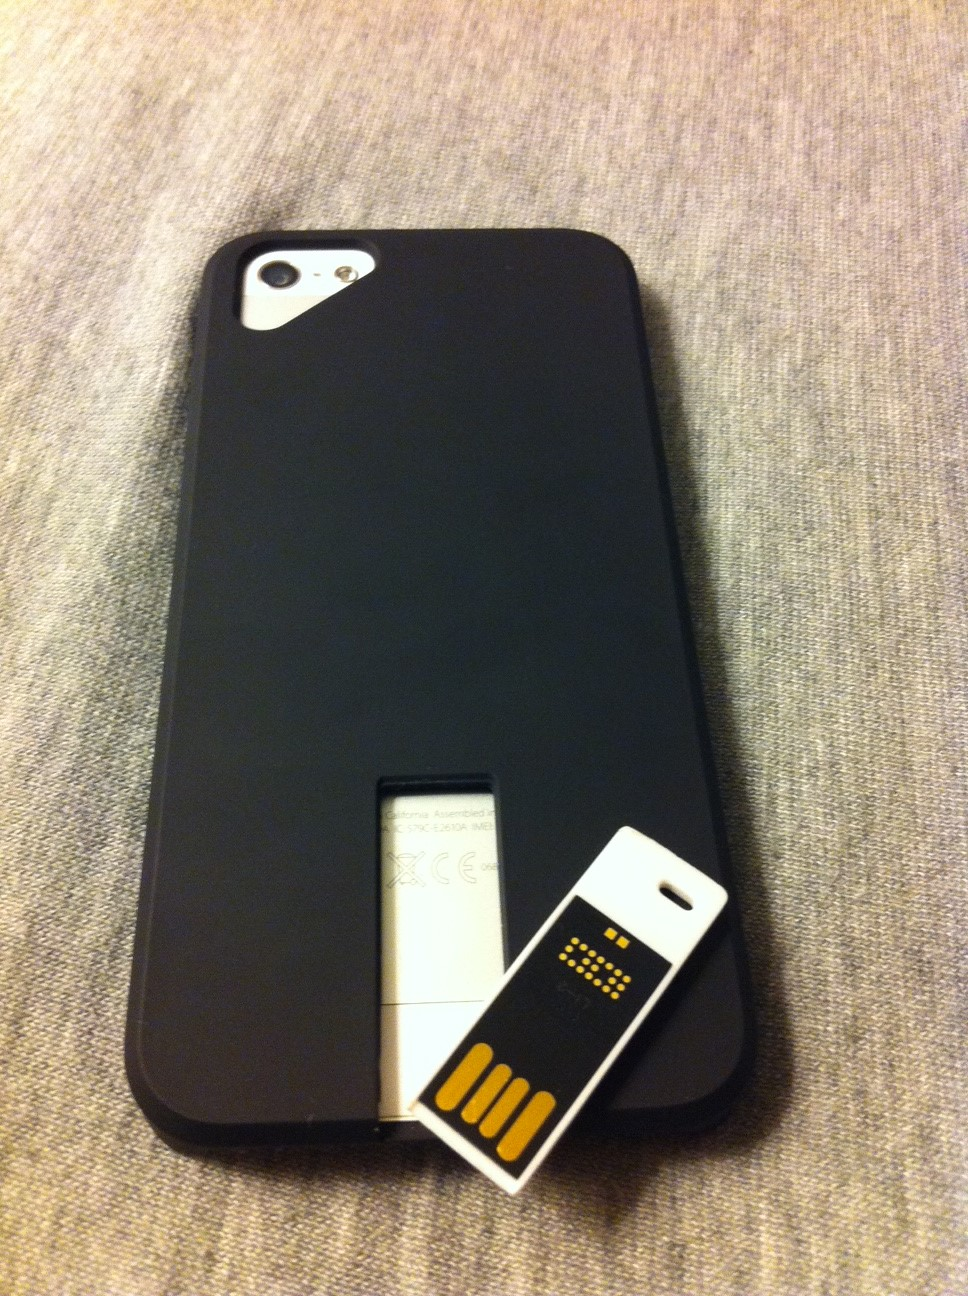 coque iphone 5 usb - Test : Ego, la coque iPhone 5 Clé USB